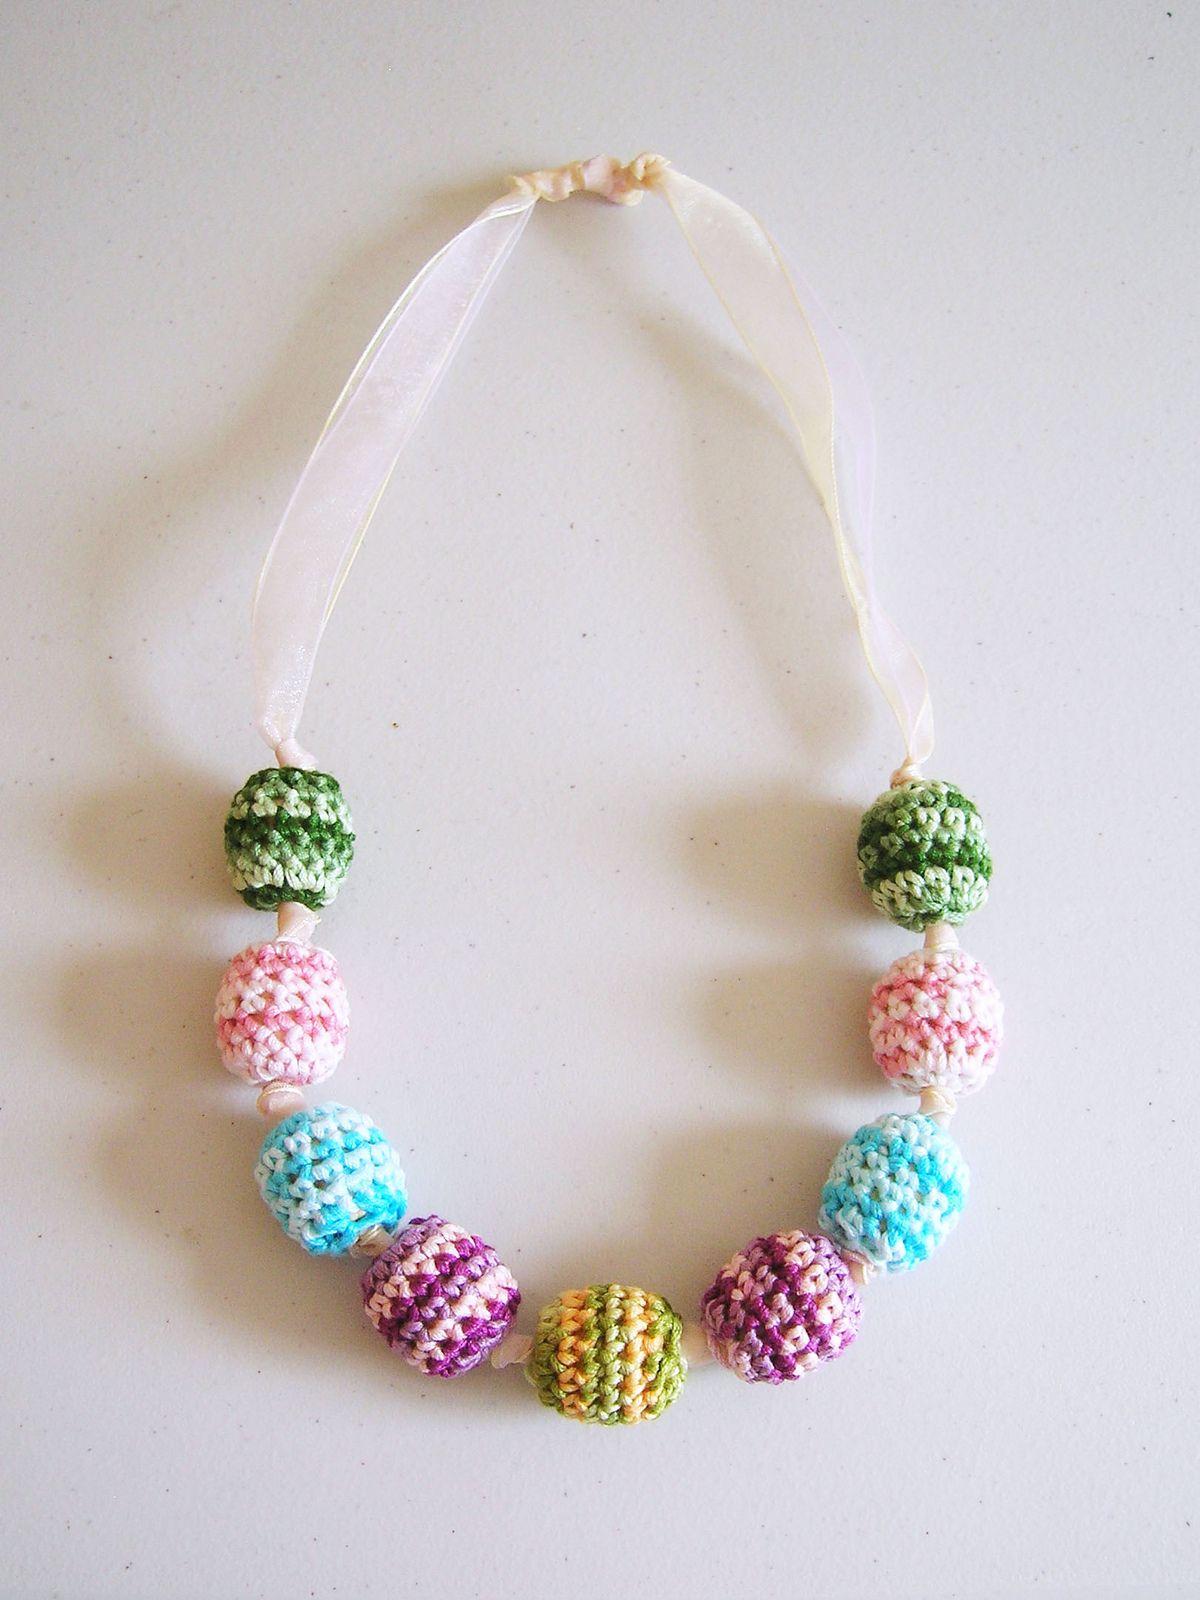 Crochet Beads Necklace By ChabeGS - Free Crochet Pattern ...